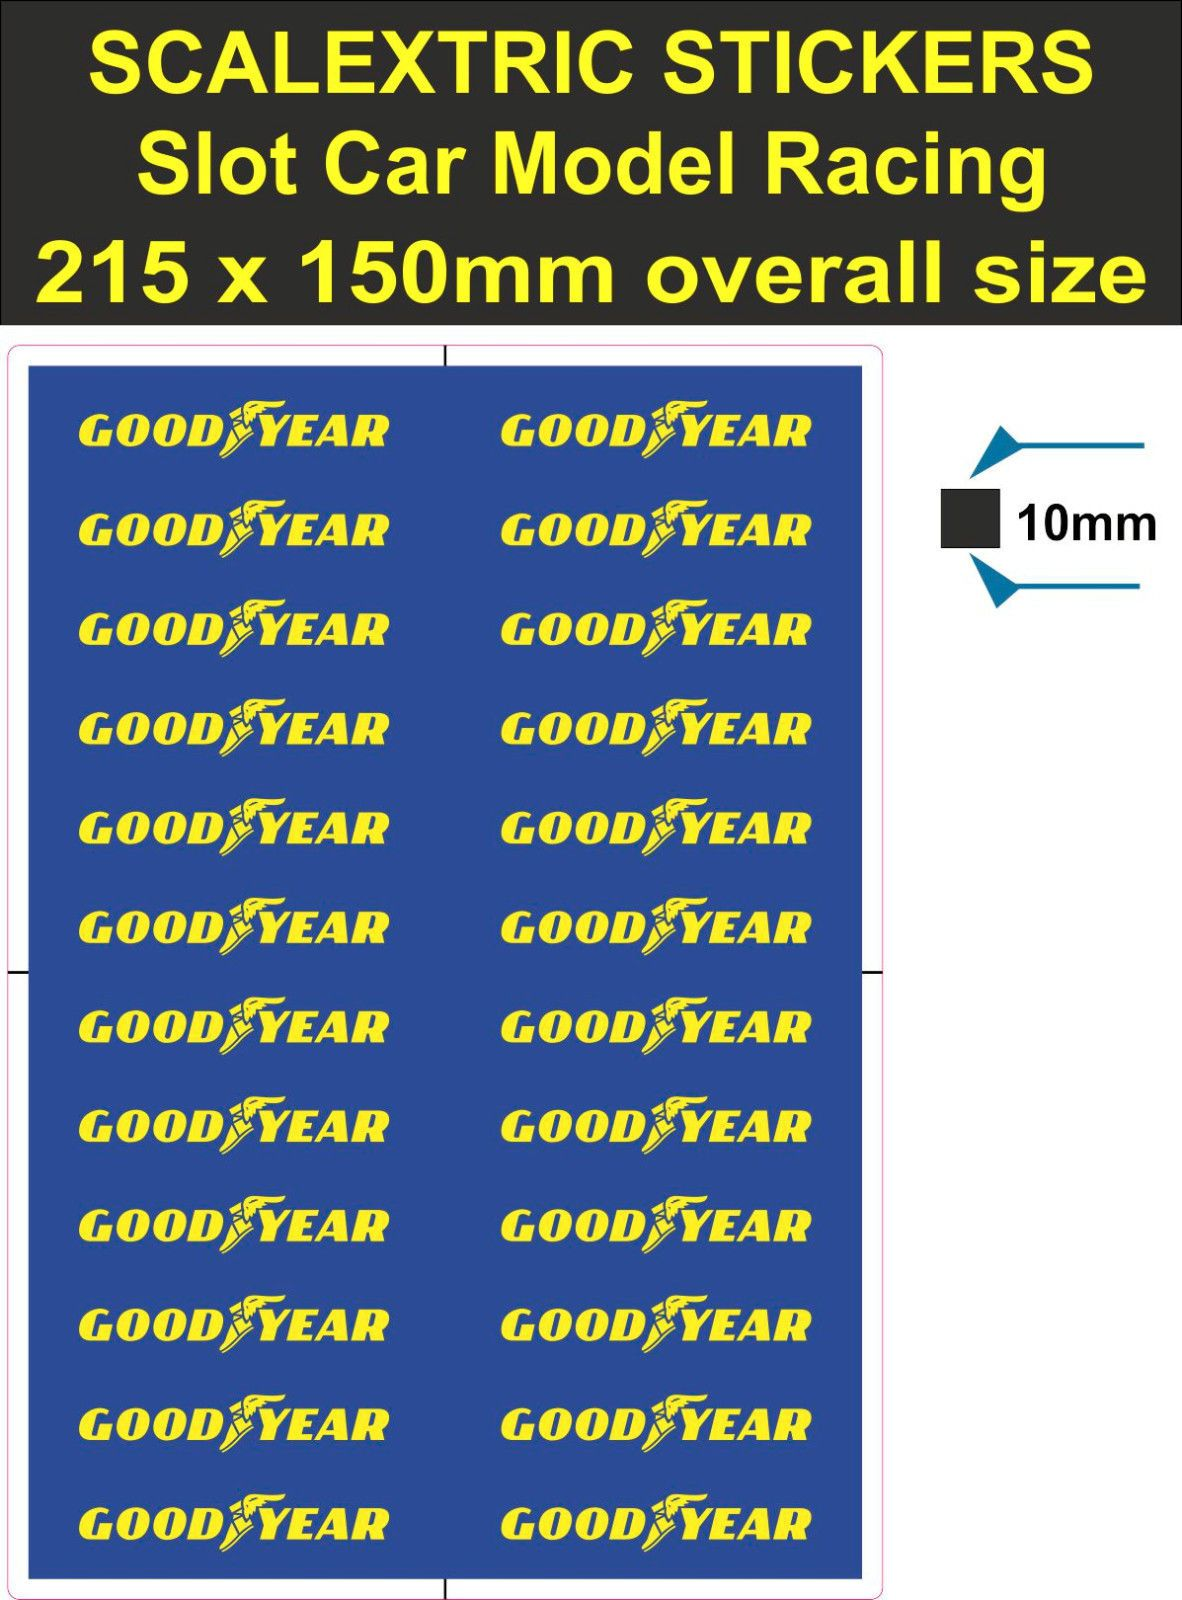 Slot Car Scalextric Sticker Model Race Goodyear Logo Lego Decal Adhesive Vinyl T Slot Cars Slot Car Tracks Car Decals [ 1600 x 1182 Pixel ]